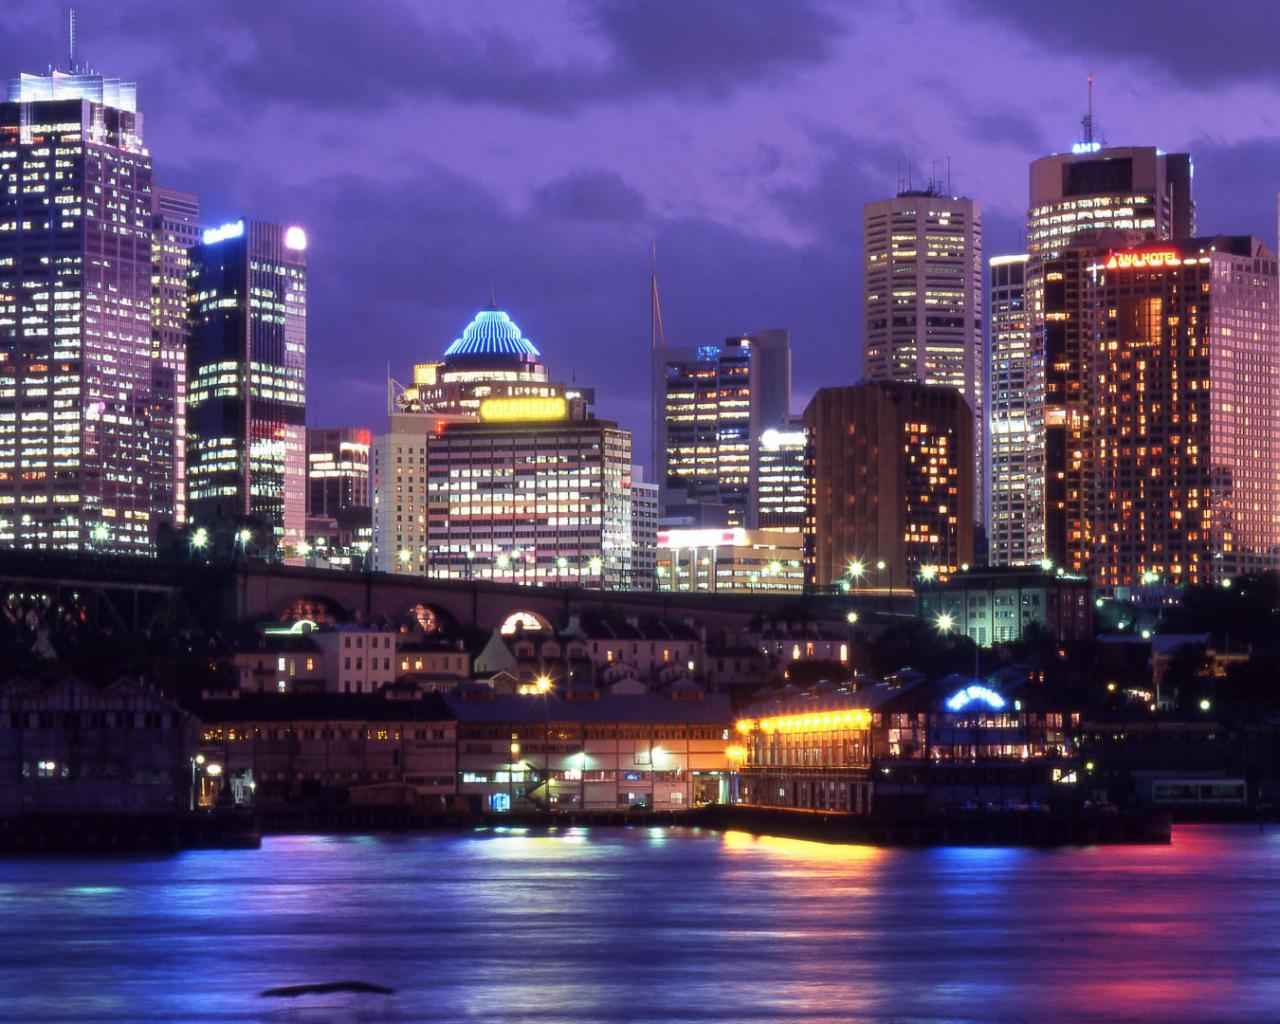 Сидней австралия даунтаун обои для